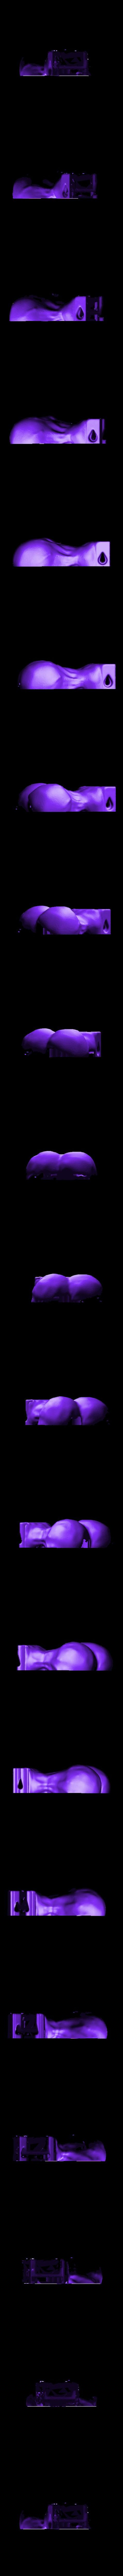 Balls1.stl Download STL file Testicle Ballsack Airsoft adapt • 3D printing template, LordLilapause